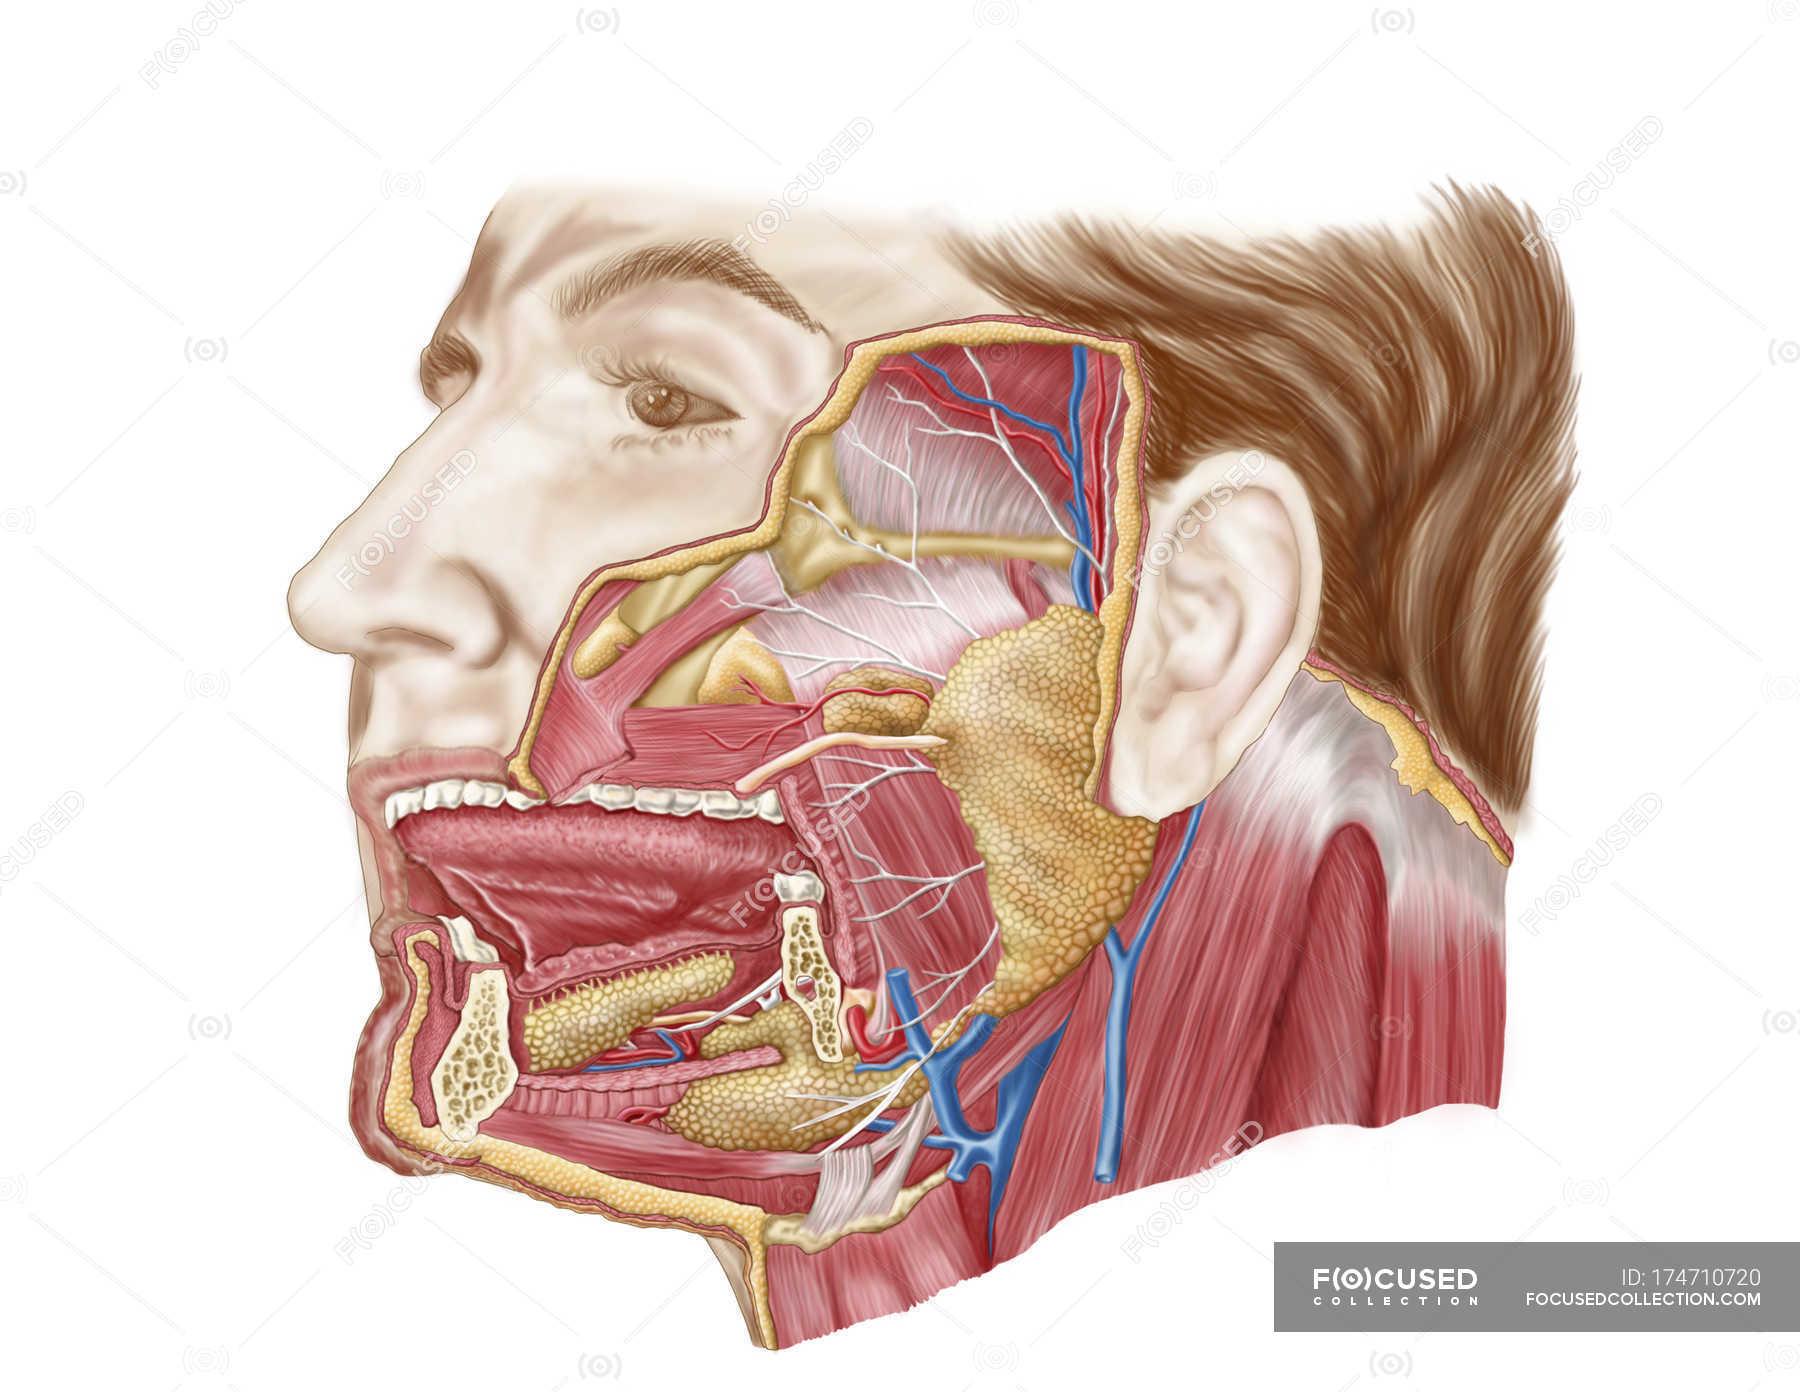 Mouth Anatomy Diagram Glands - DIY Enthusiasts Wiring Diagrams •